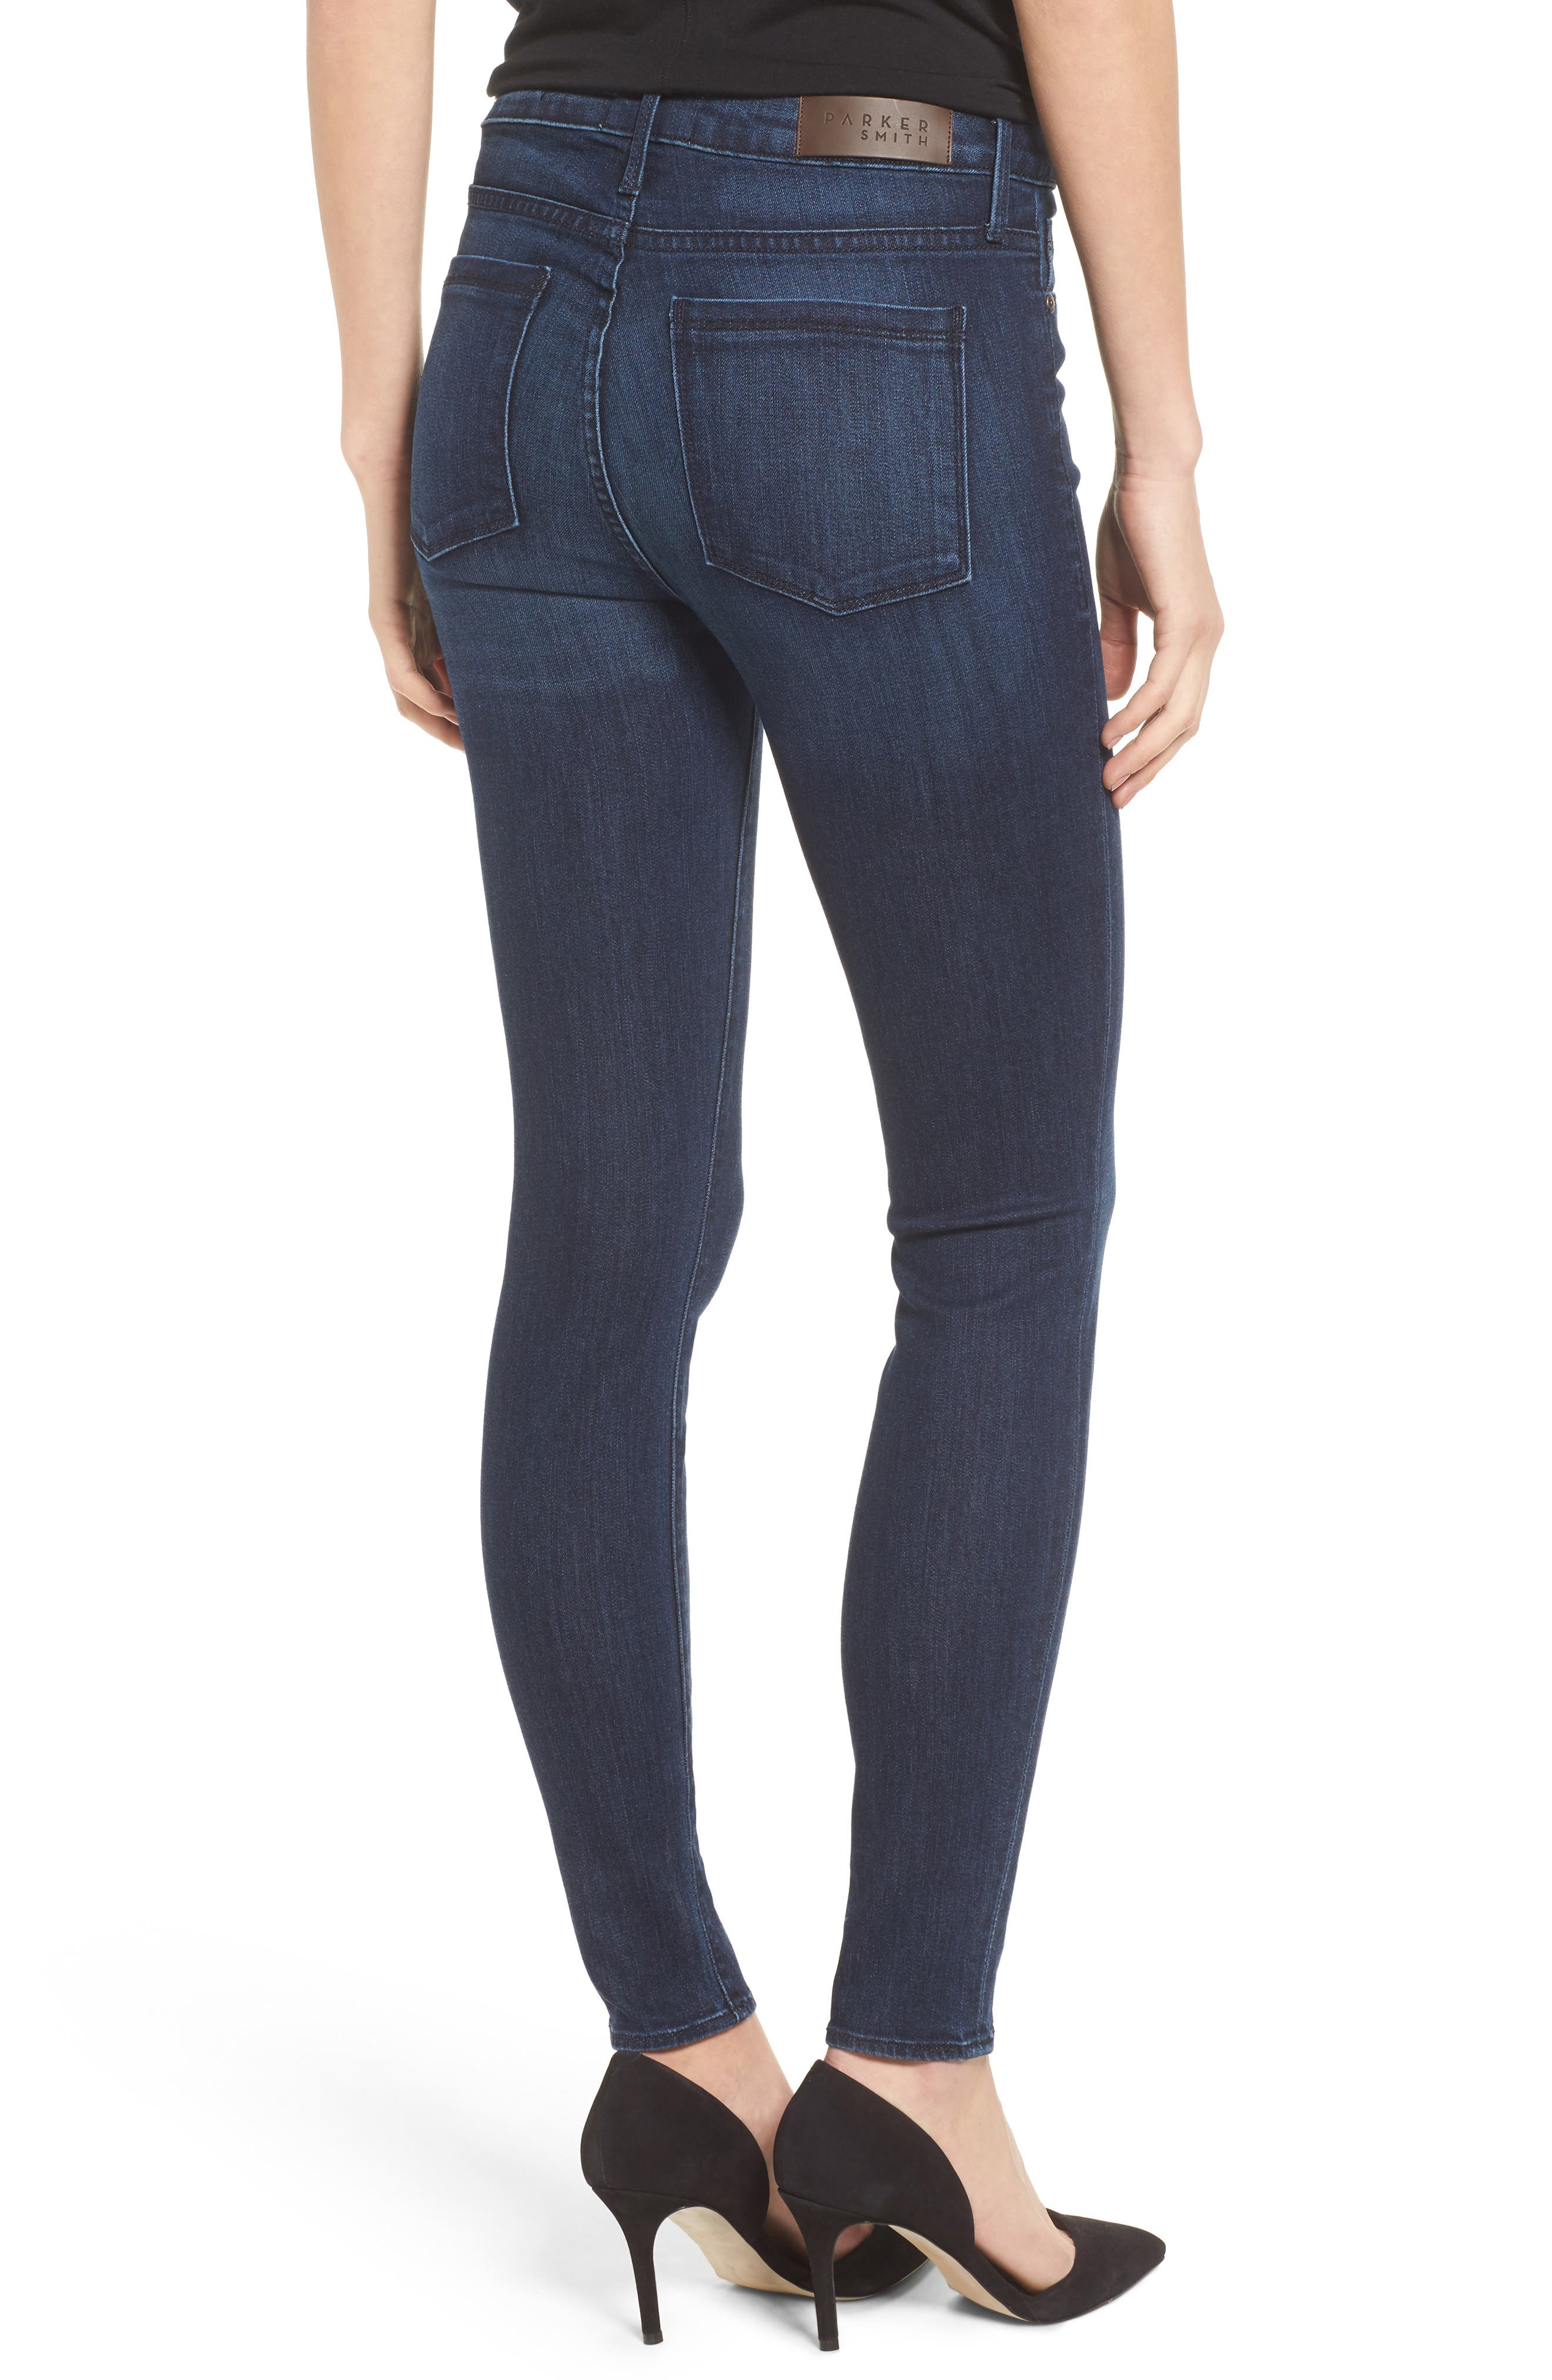 Bombshell High Waist Stretch Skinny Jeans,                             Alternate thumbnail 6, color,